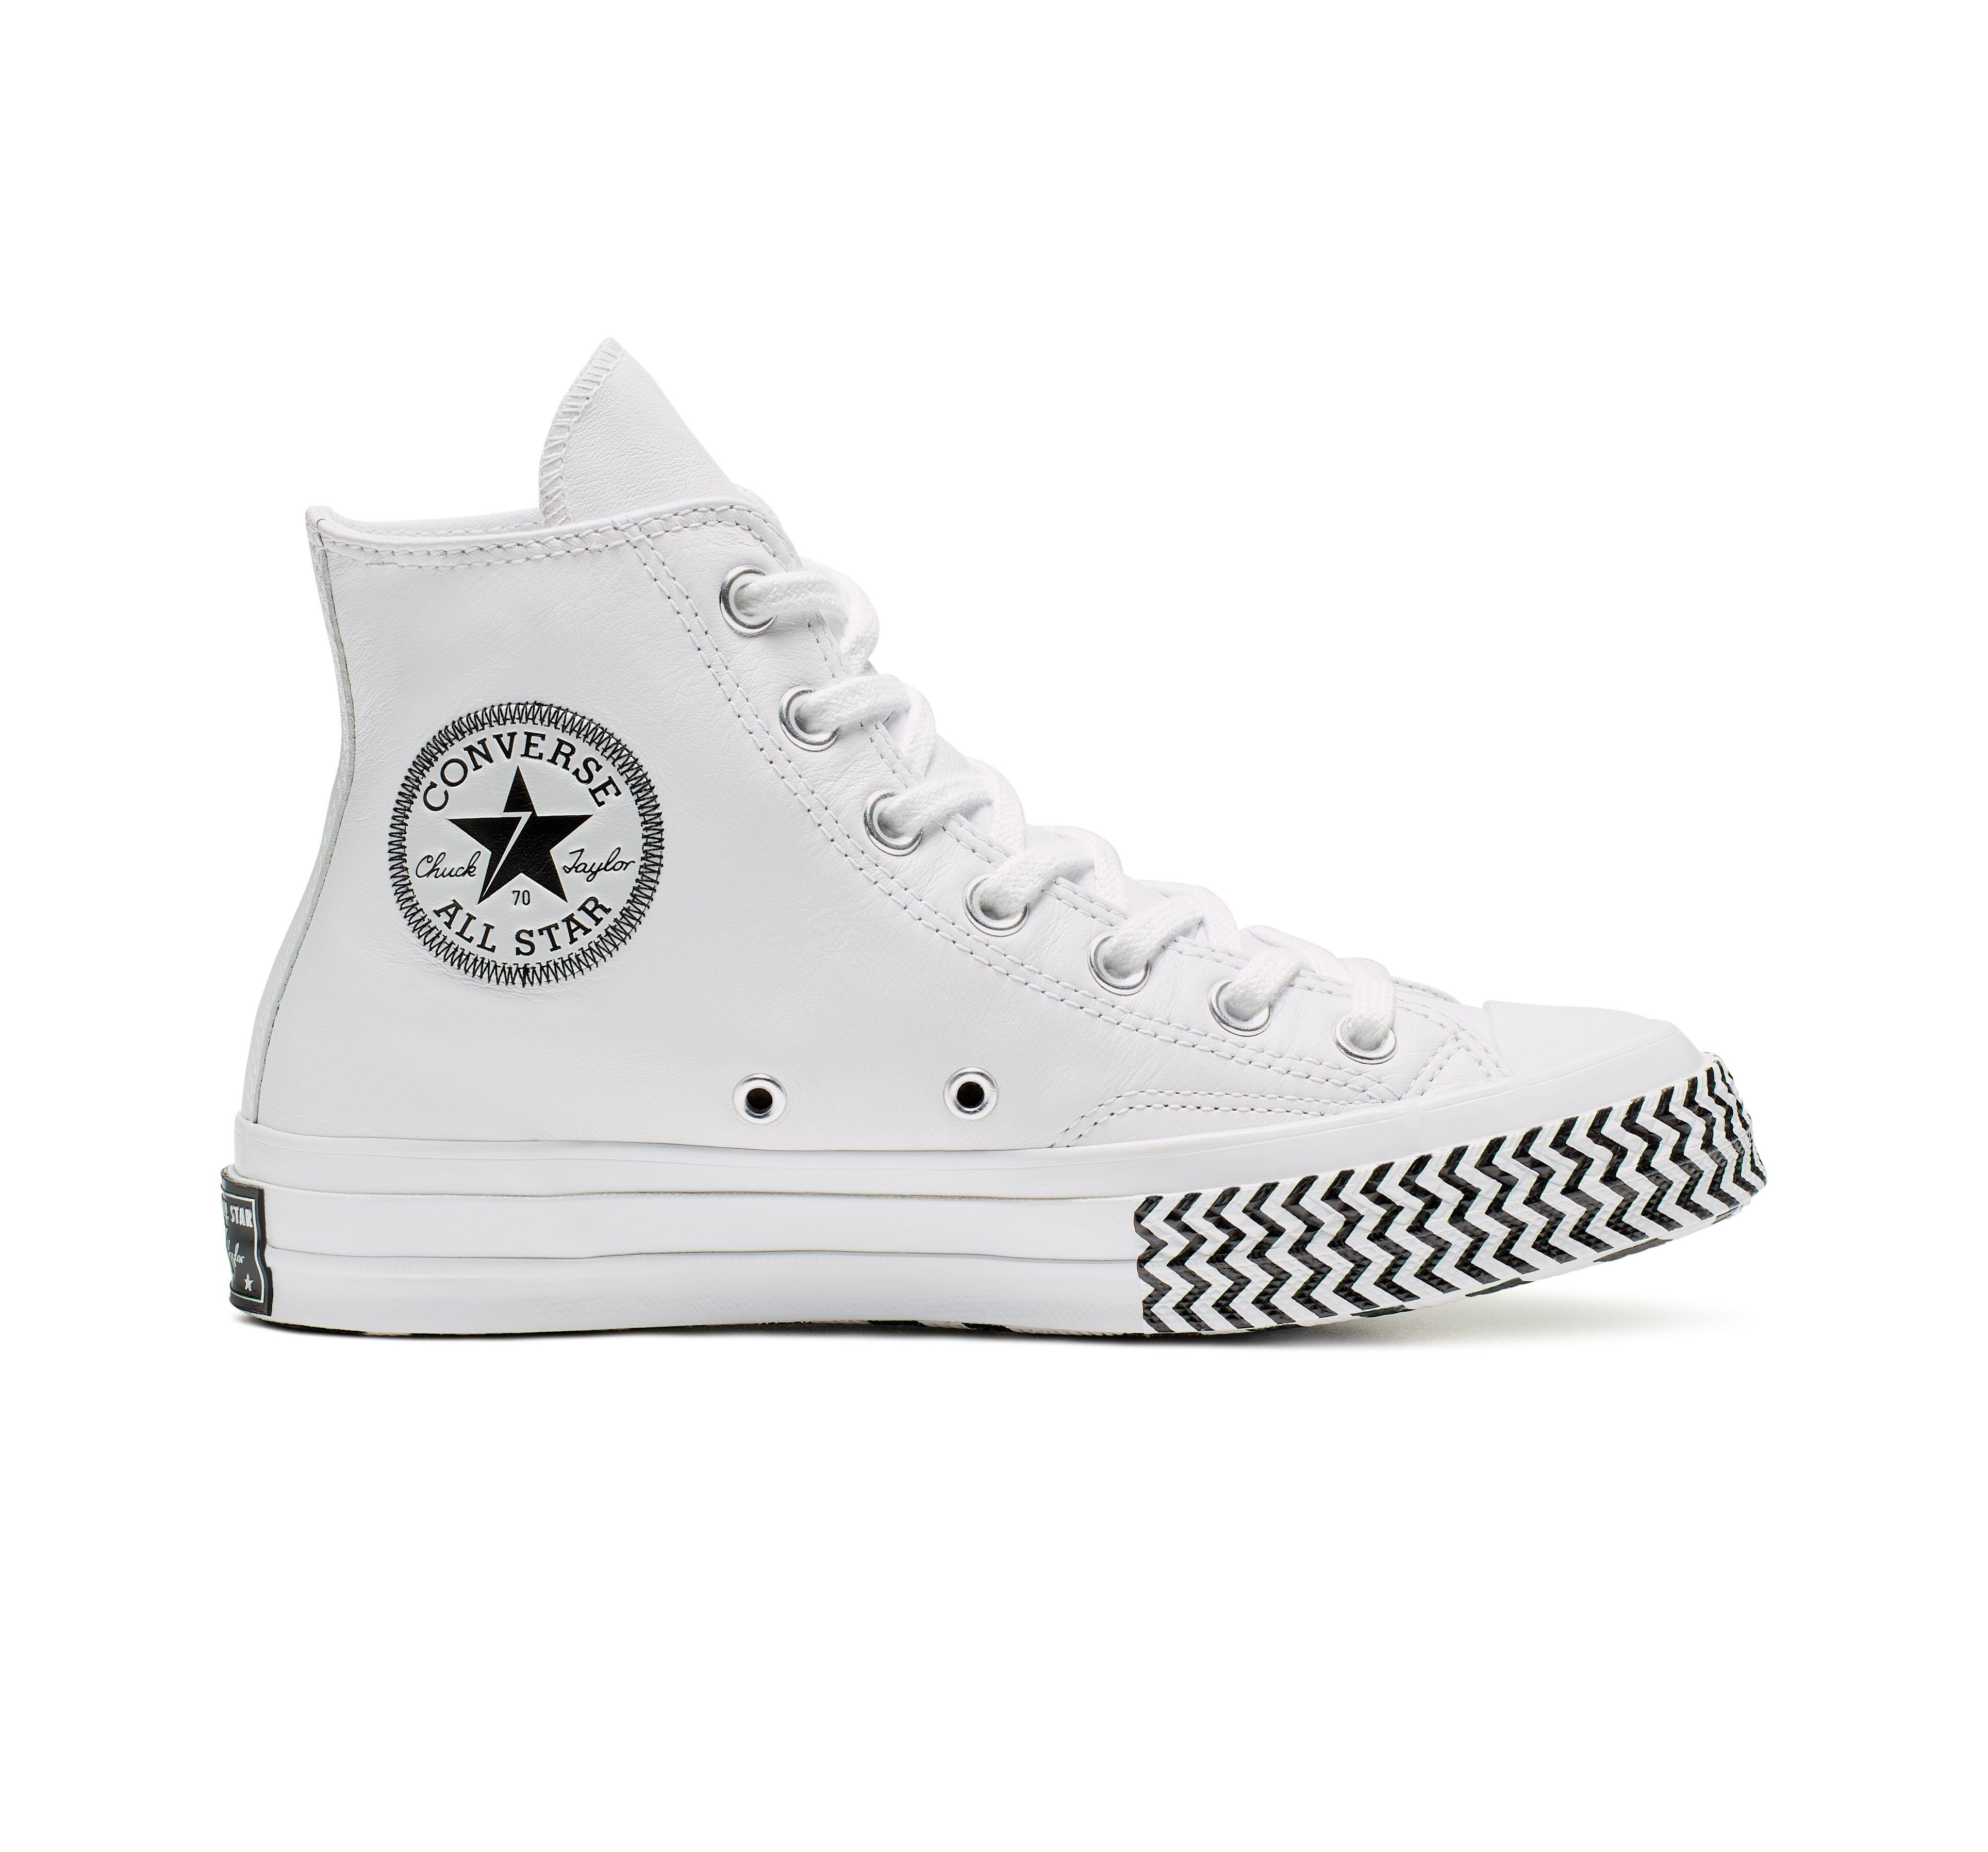 Chuck 70 VLTG High Top | Top leather shoes, High tops